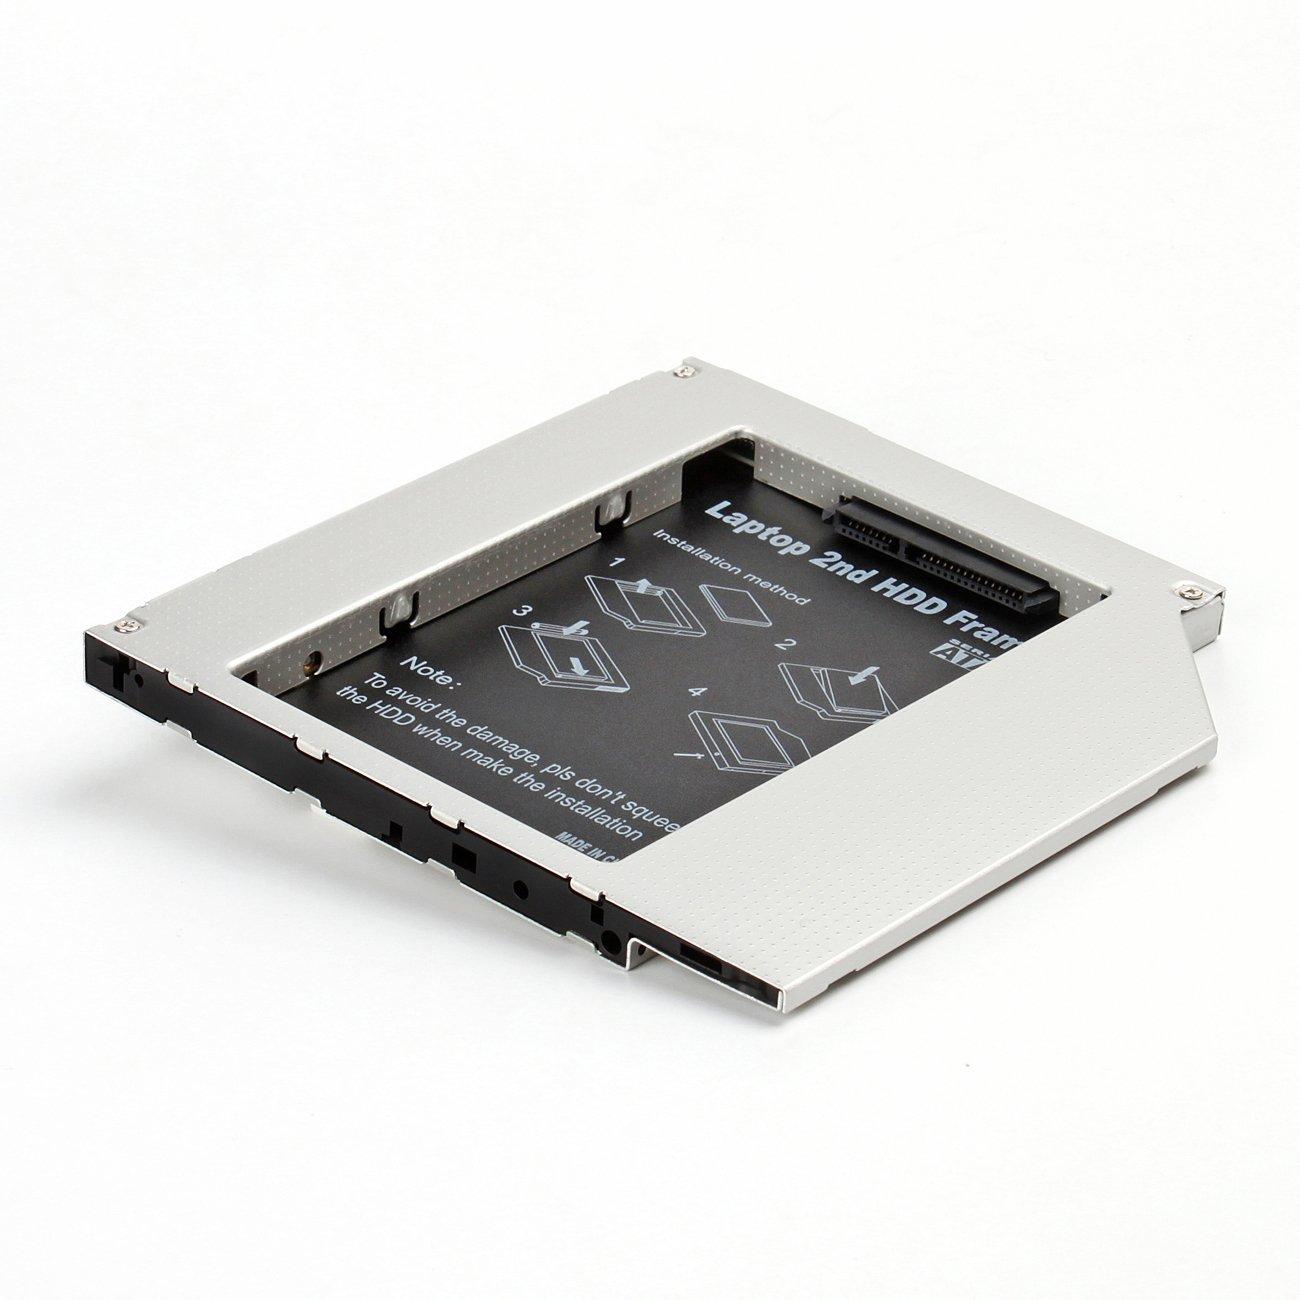 Universal 2nd SSD ODD Adaptador Bahí a de Disco Duro 2, 5' SATA HDD/SSD 9, 0mm(2.HDD Hard Drive Caddy 5 SATA HDD/SSD 9 Salcar 6115